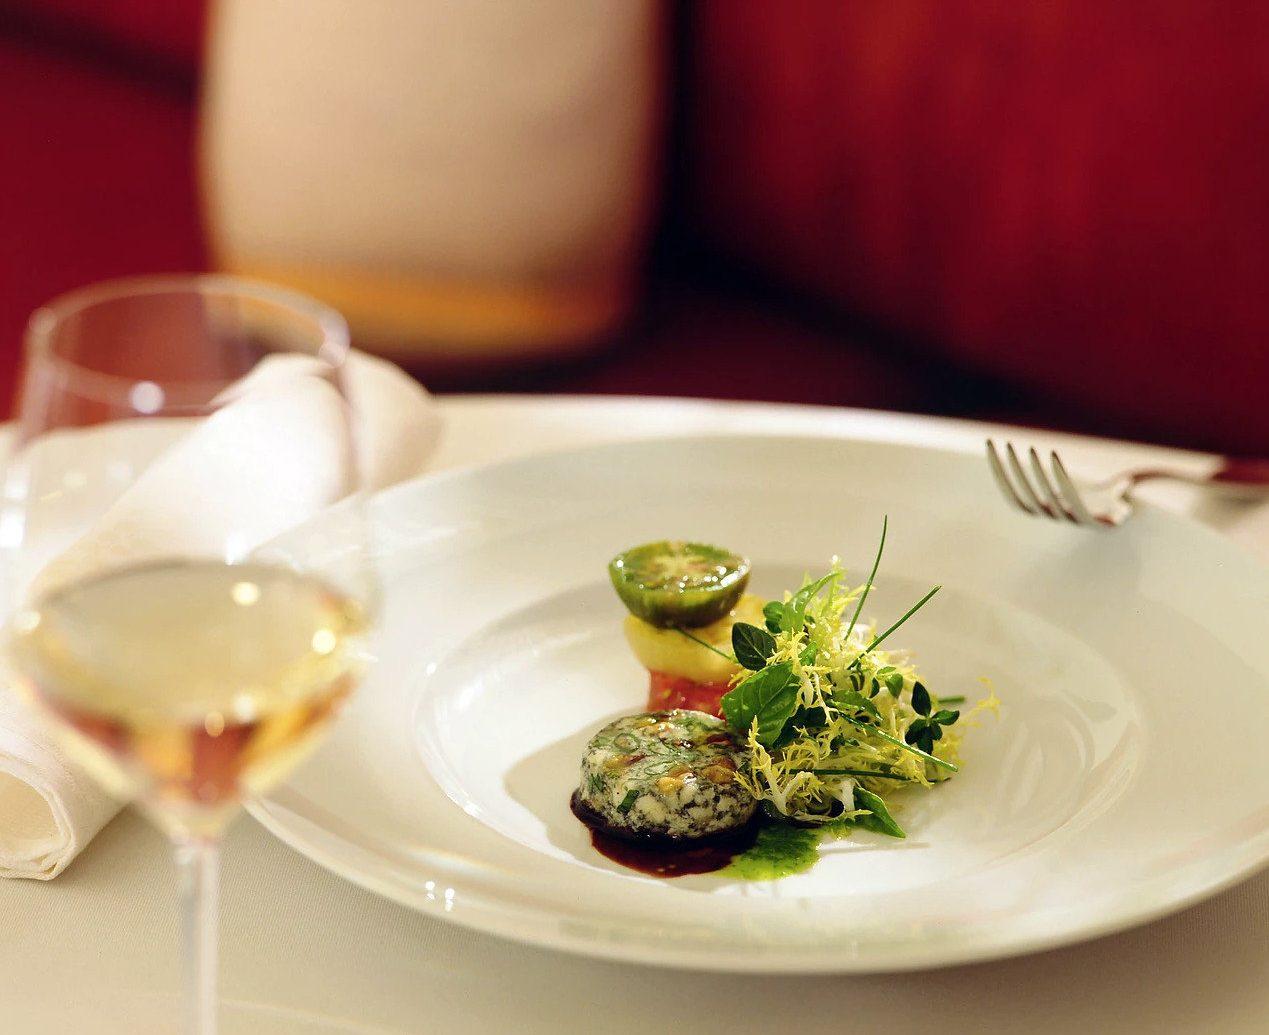 Trip Ideas plate food table dish indoor meal restaurant cuisine dinner white produce sense breakfast supper